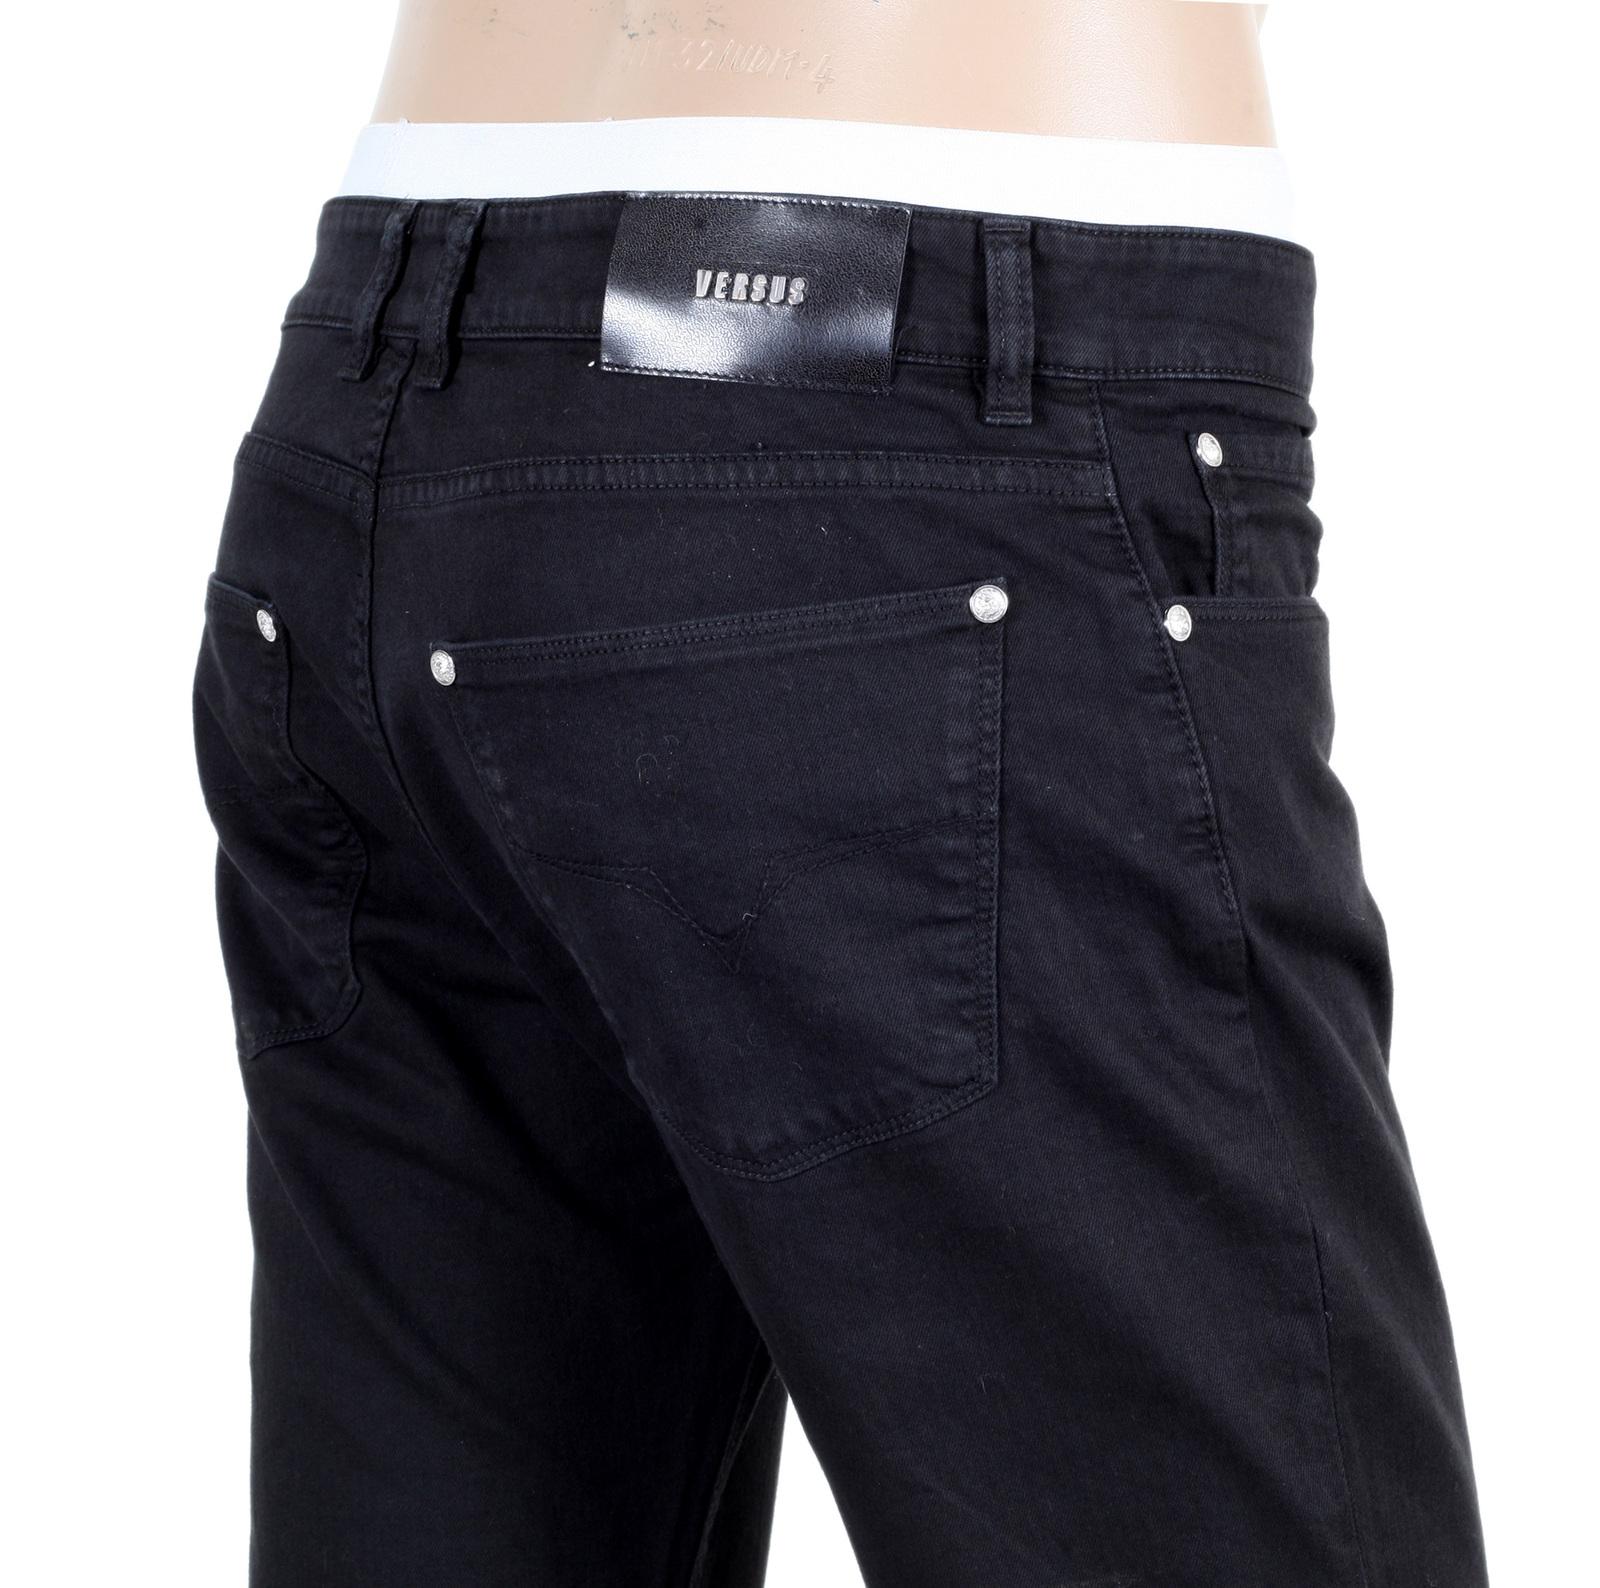 Mens Slim Stretch Jeans